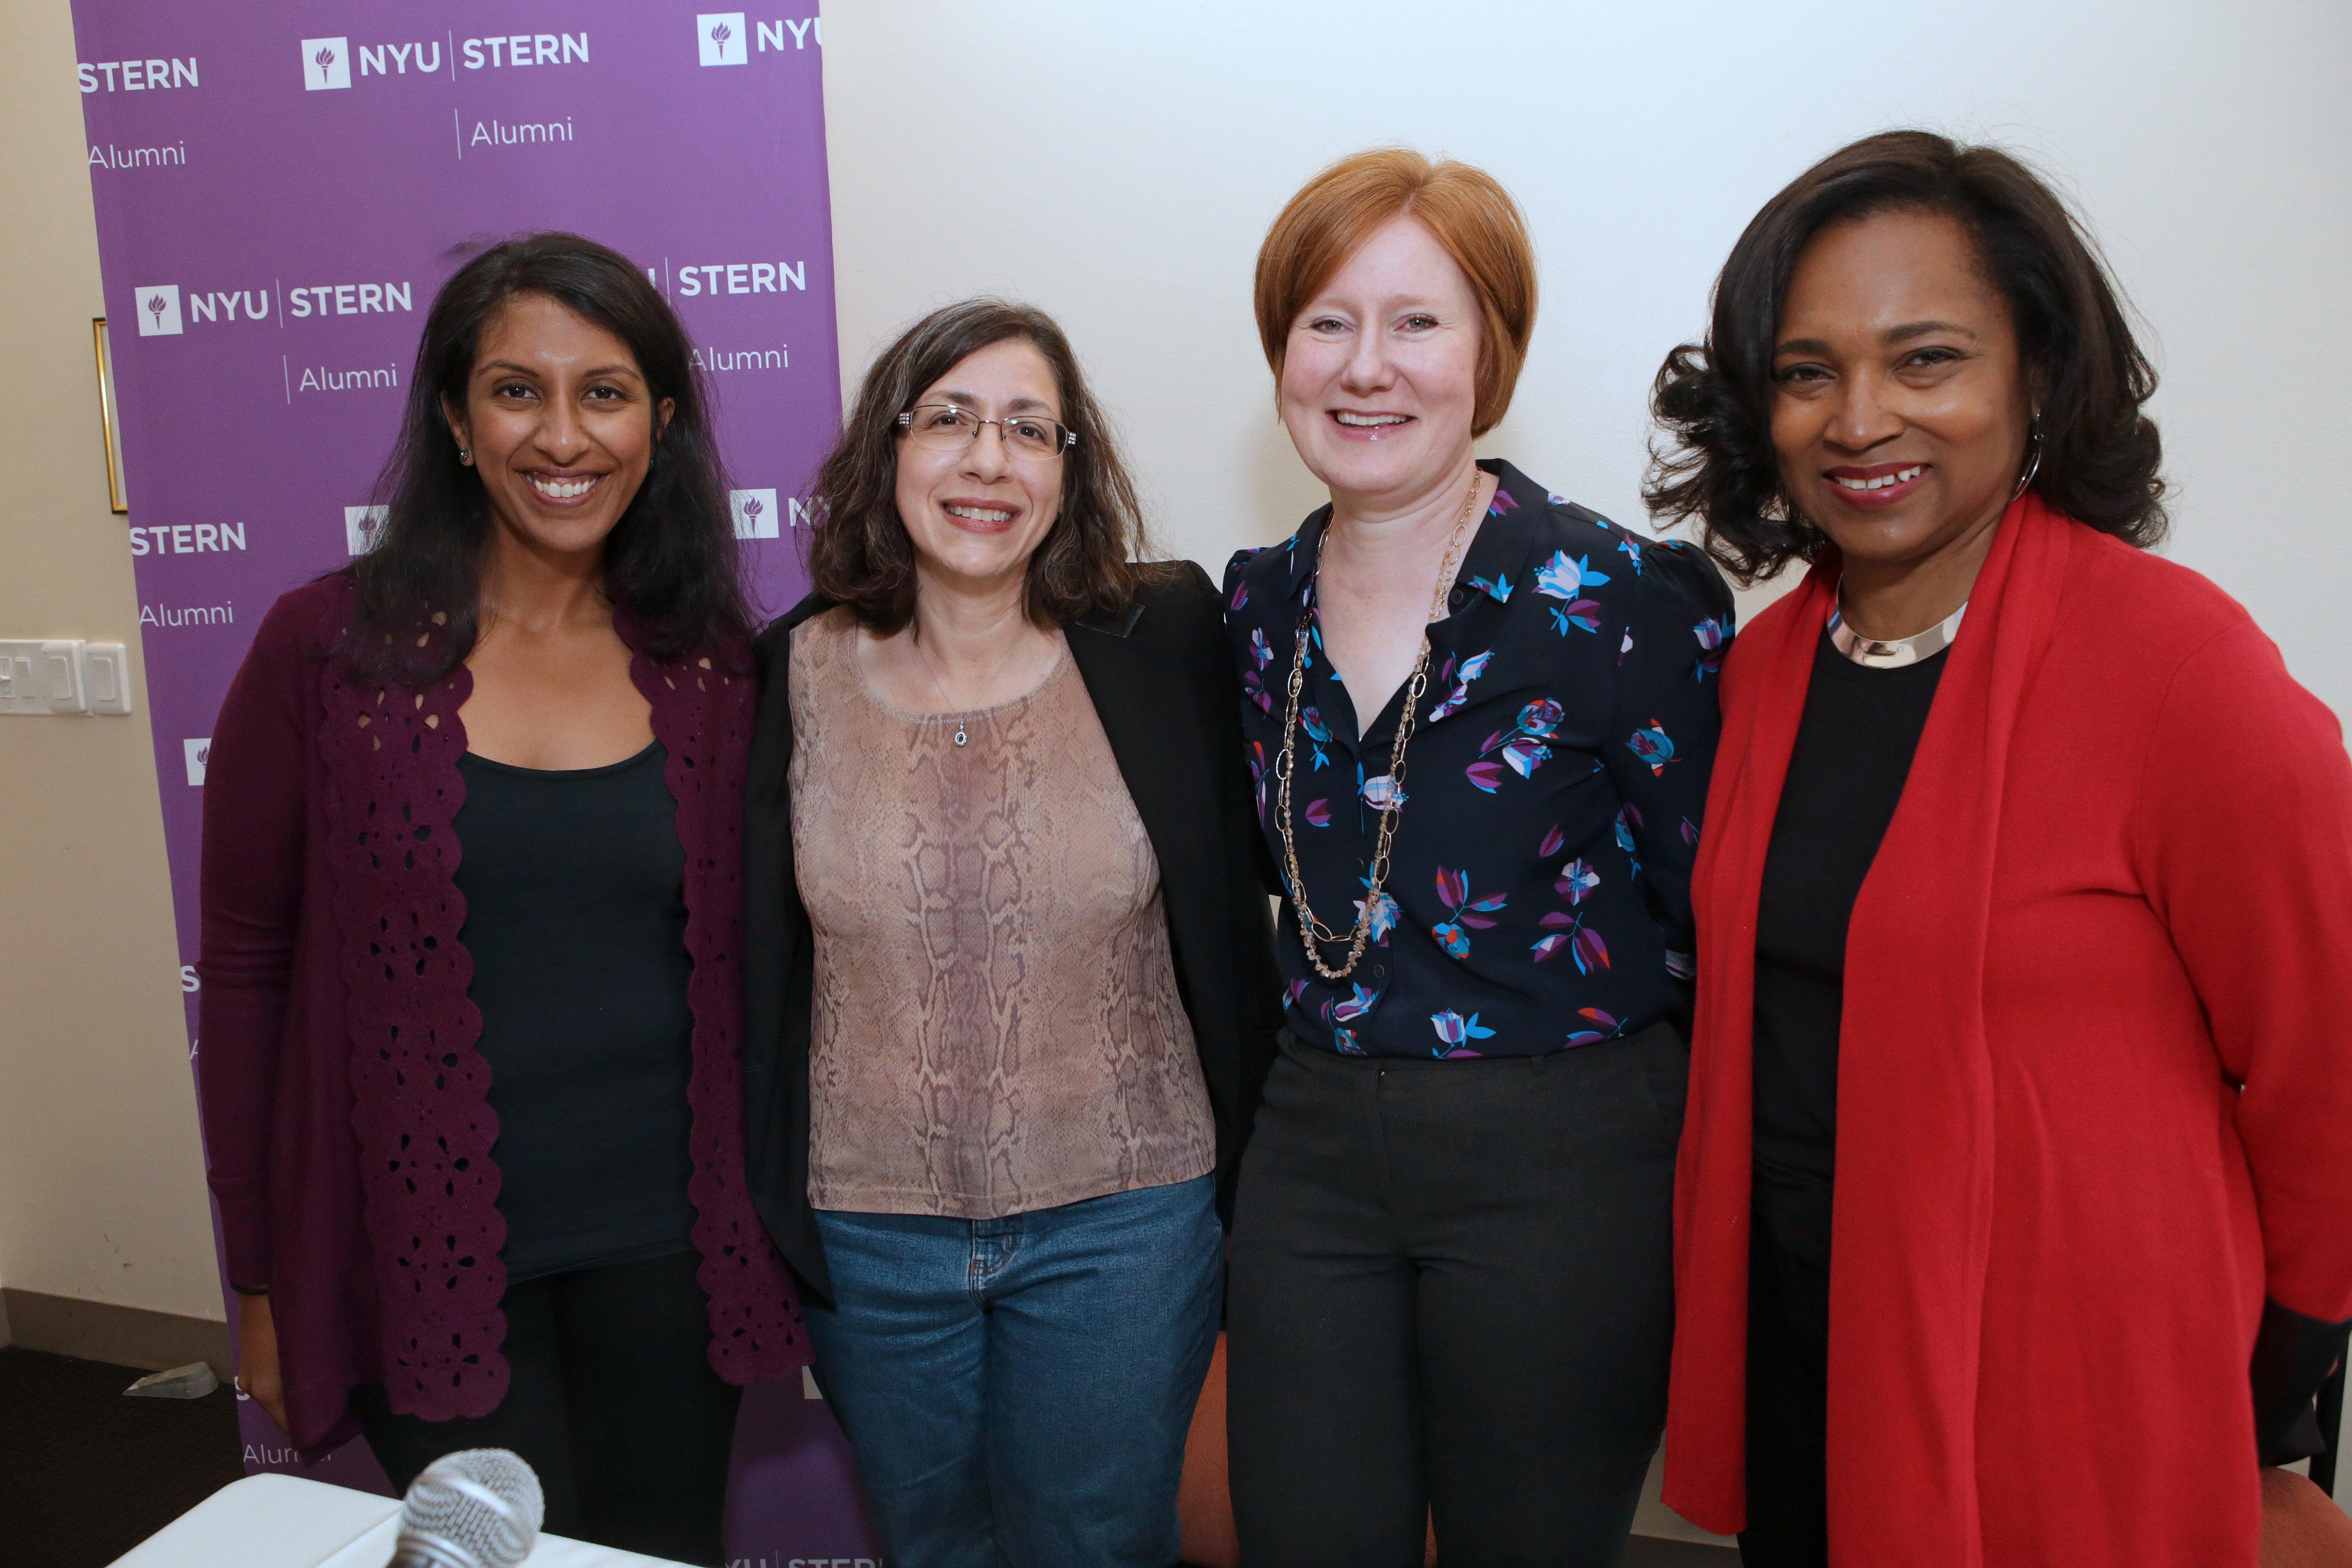 Stern alumnae panelists at Alumni Day